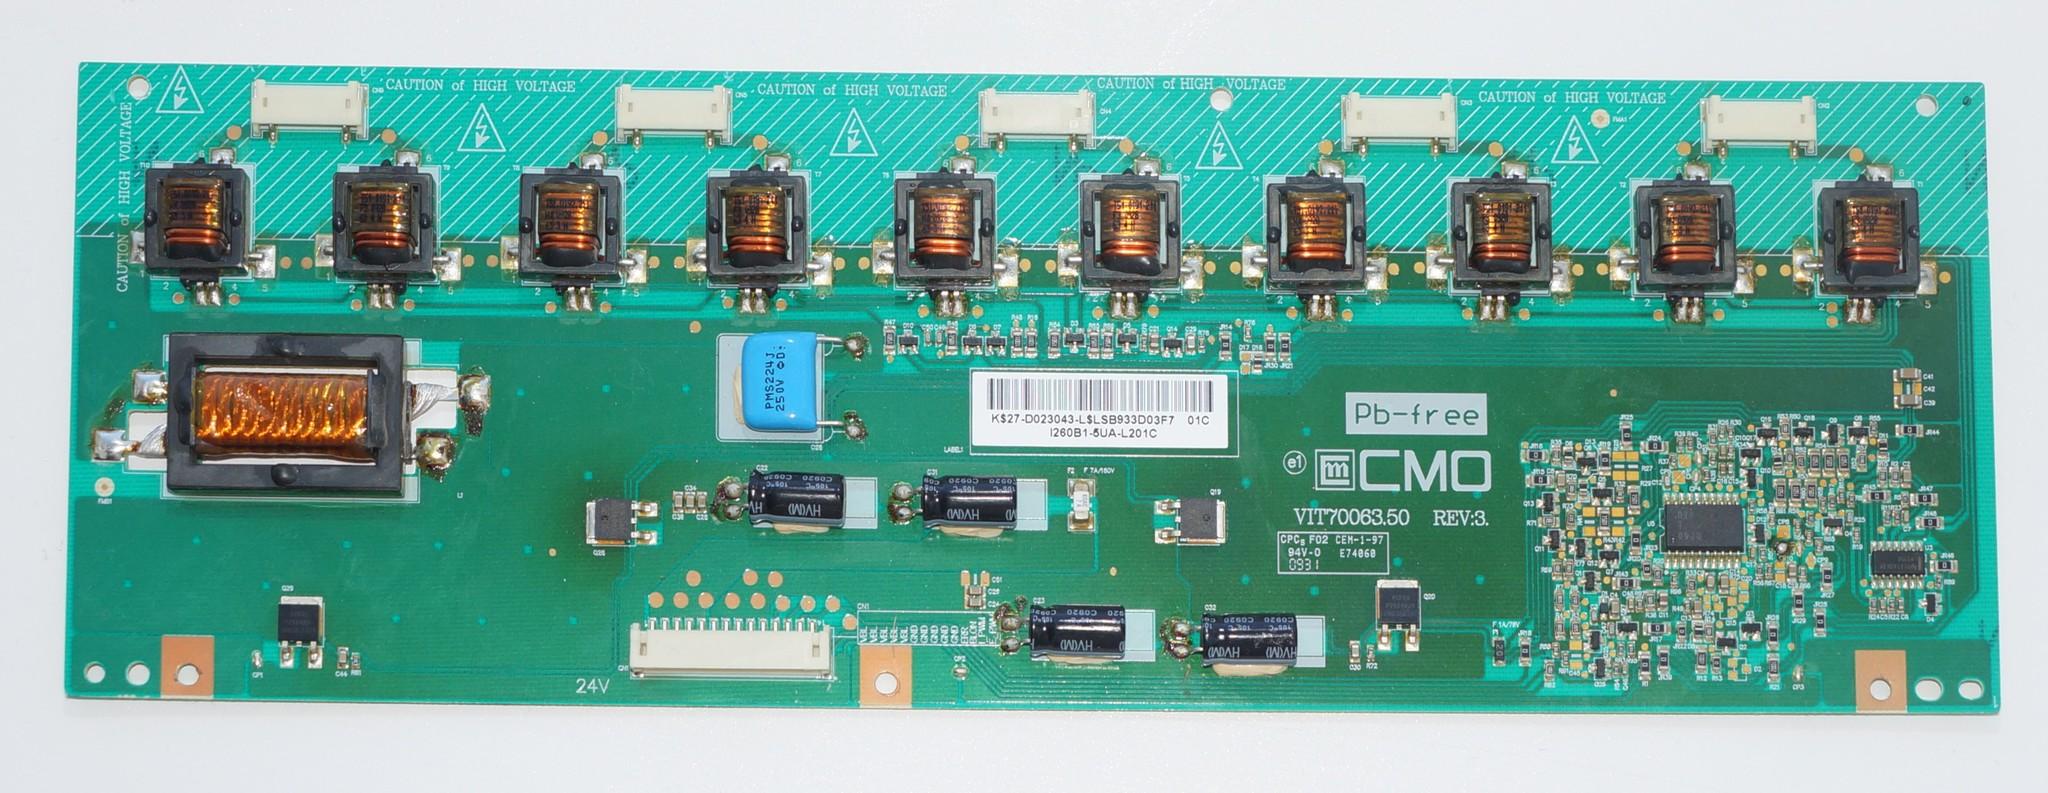 VIT70063.50 rev:3 инвертор телевизора Toshiba